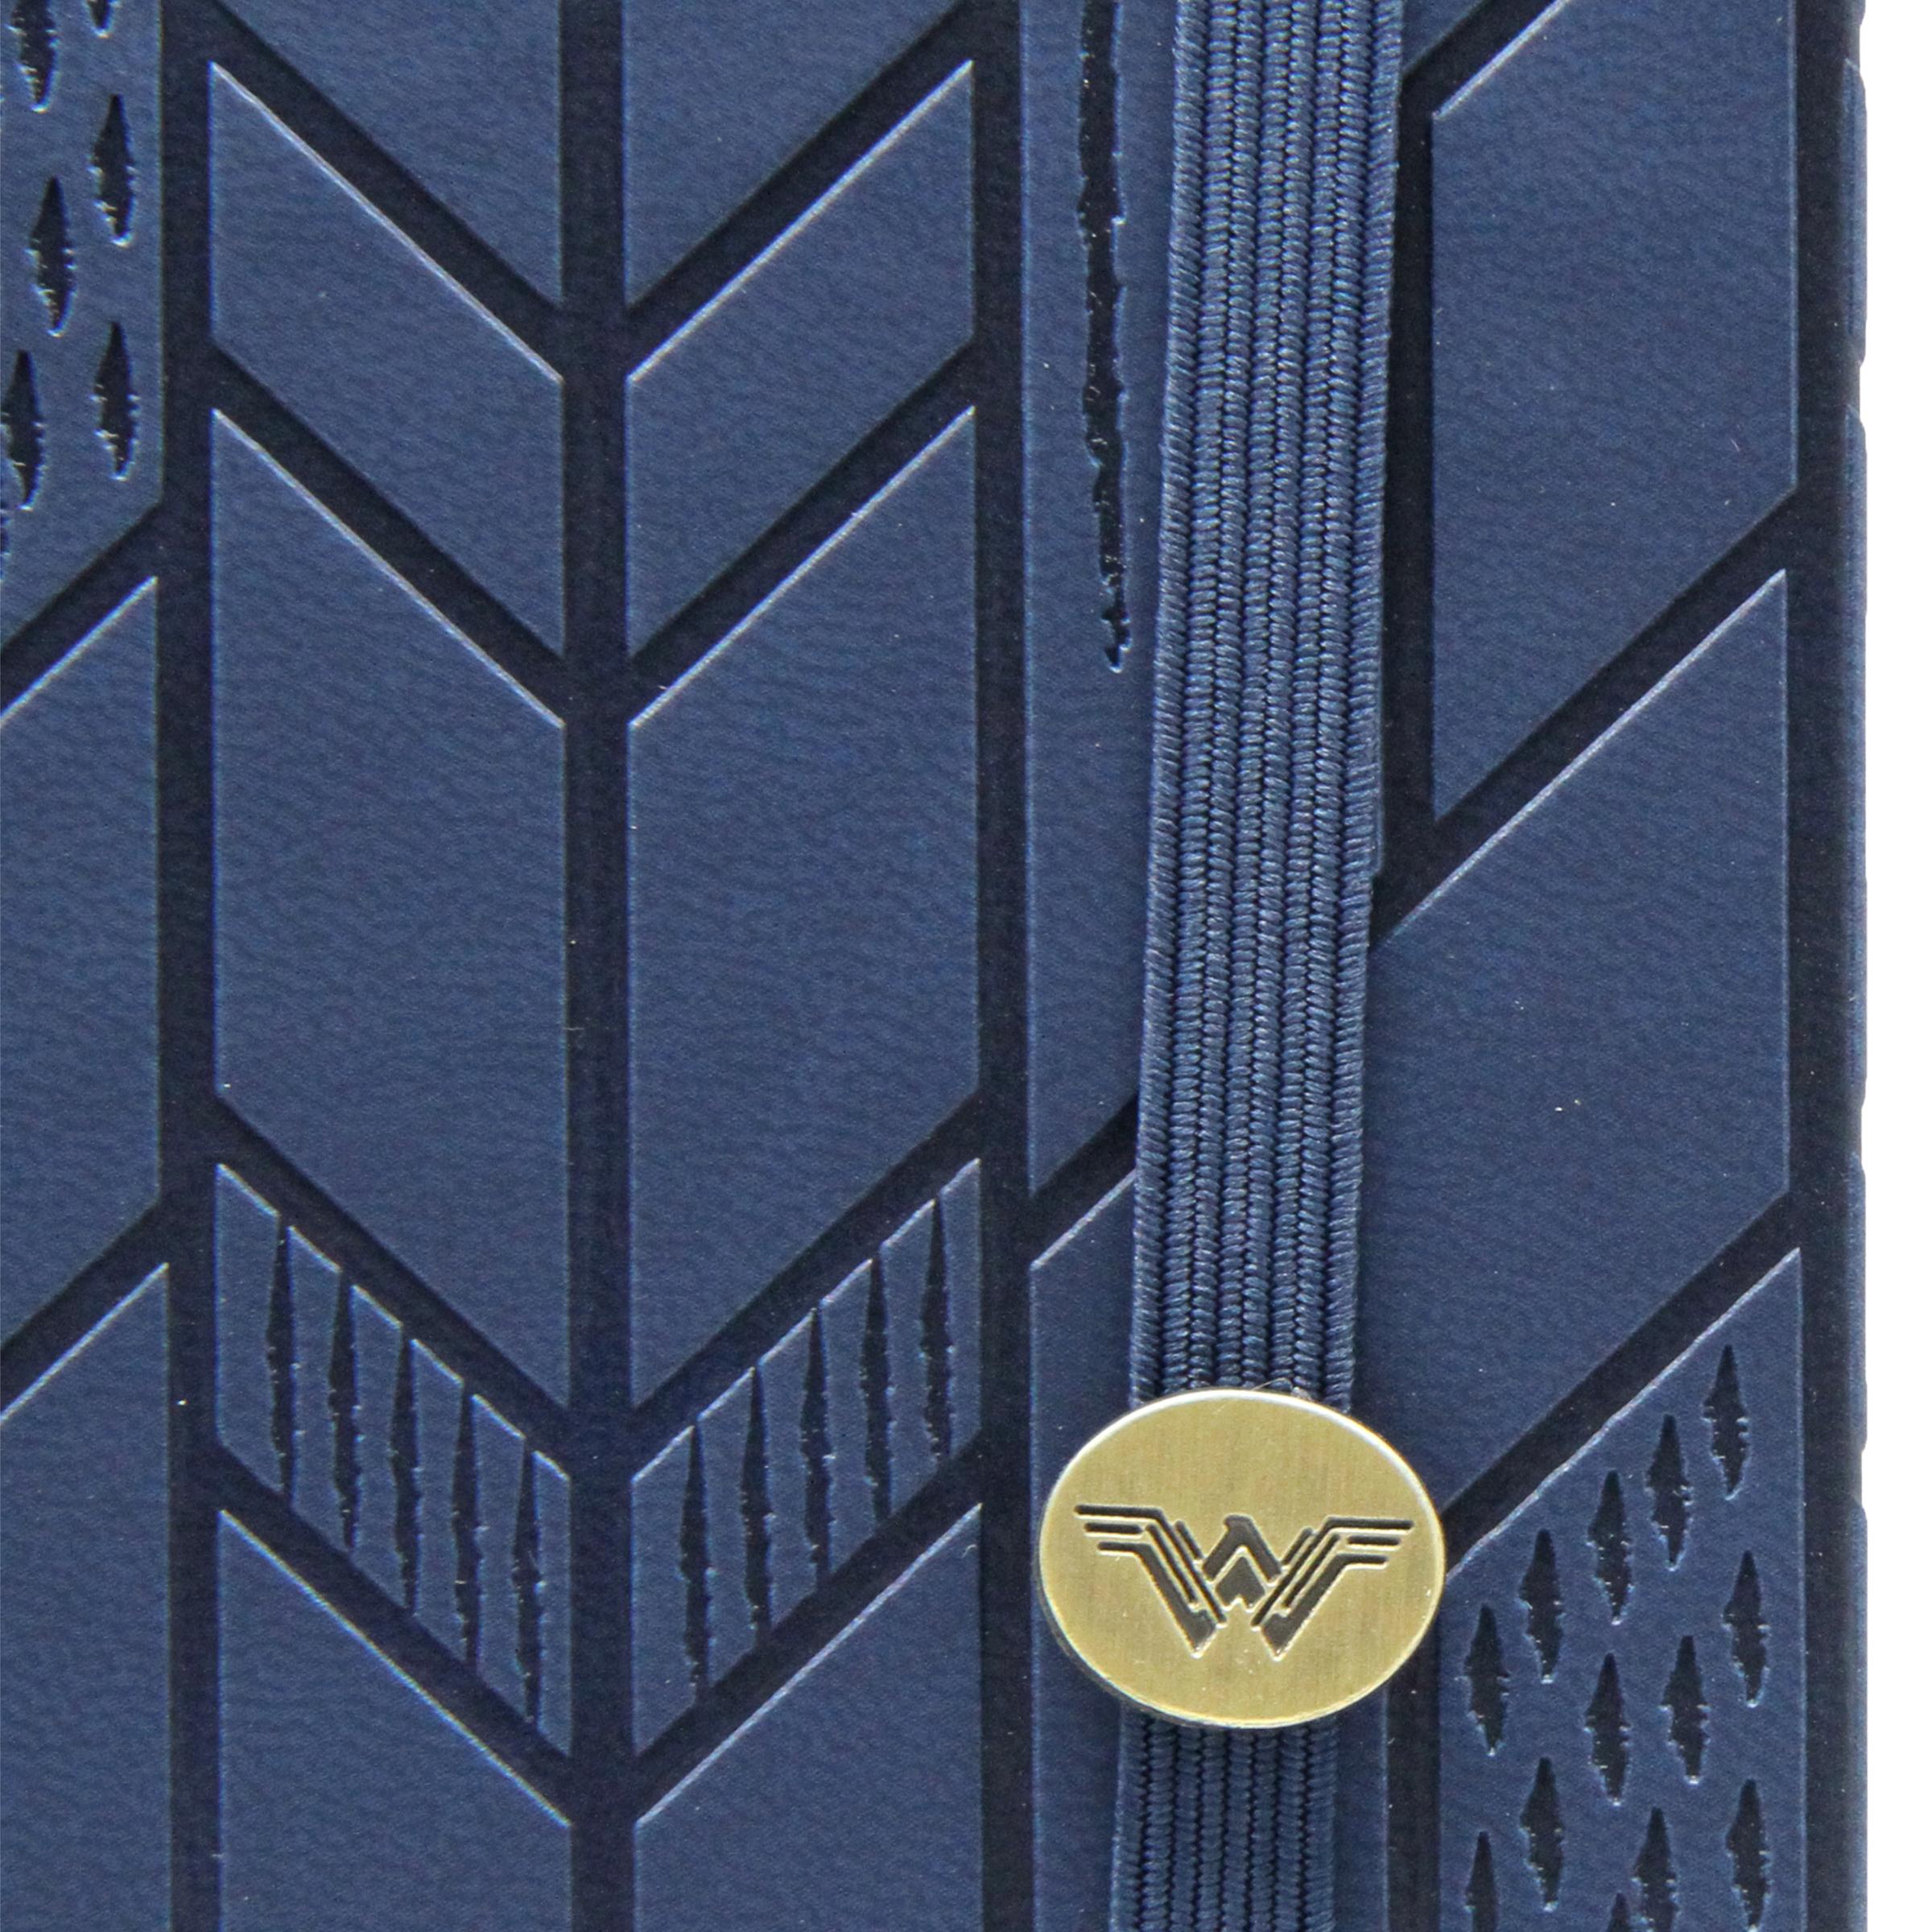 wonder-woman-notebook-4.jpg